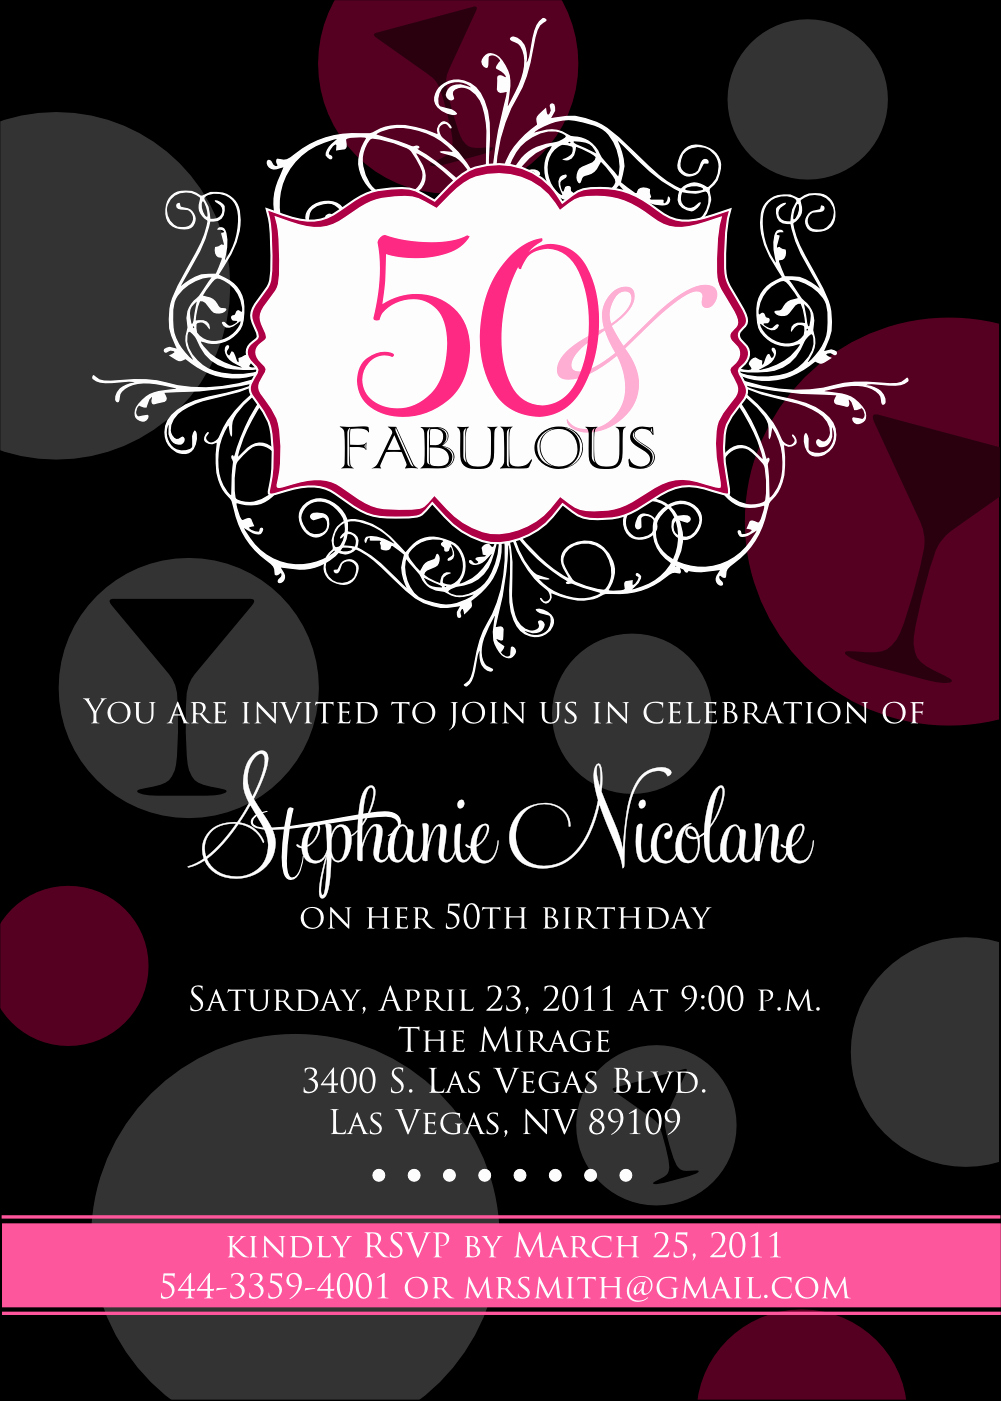 50th Birthday Invitation Ideas Lovely 50th Birthday Beach Party Invitations